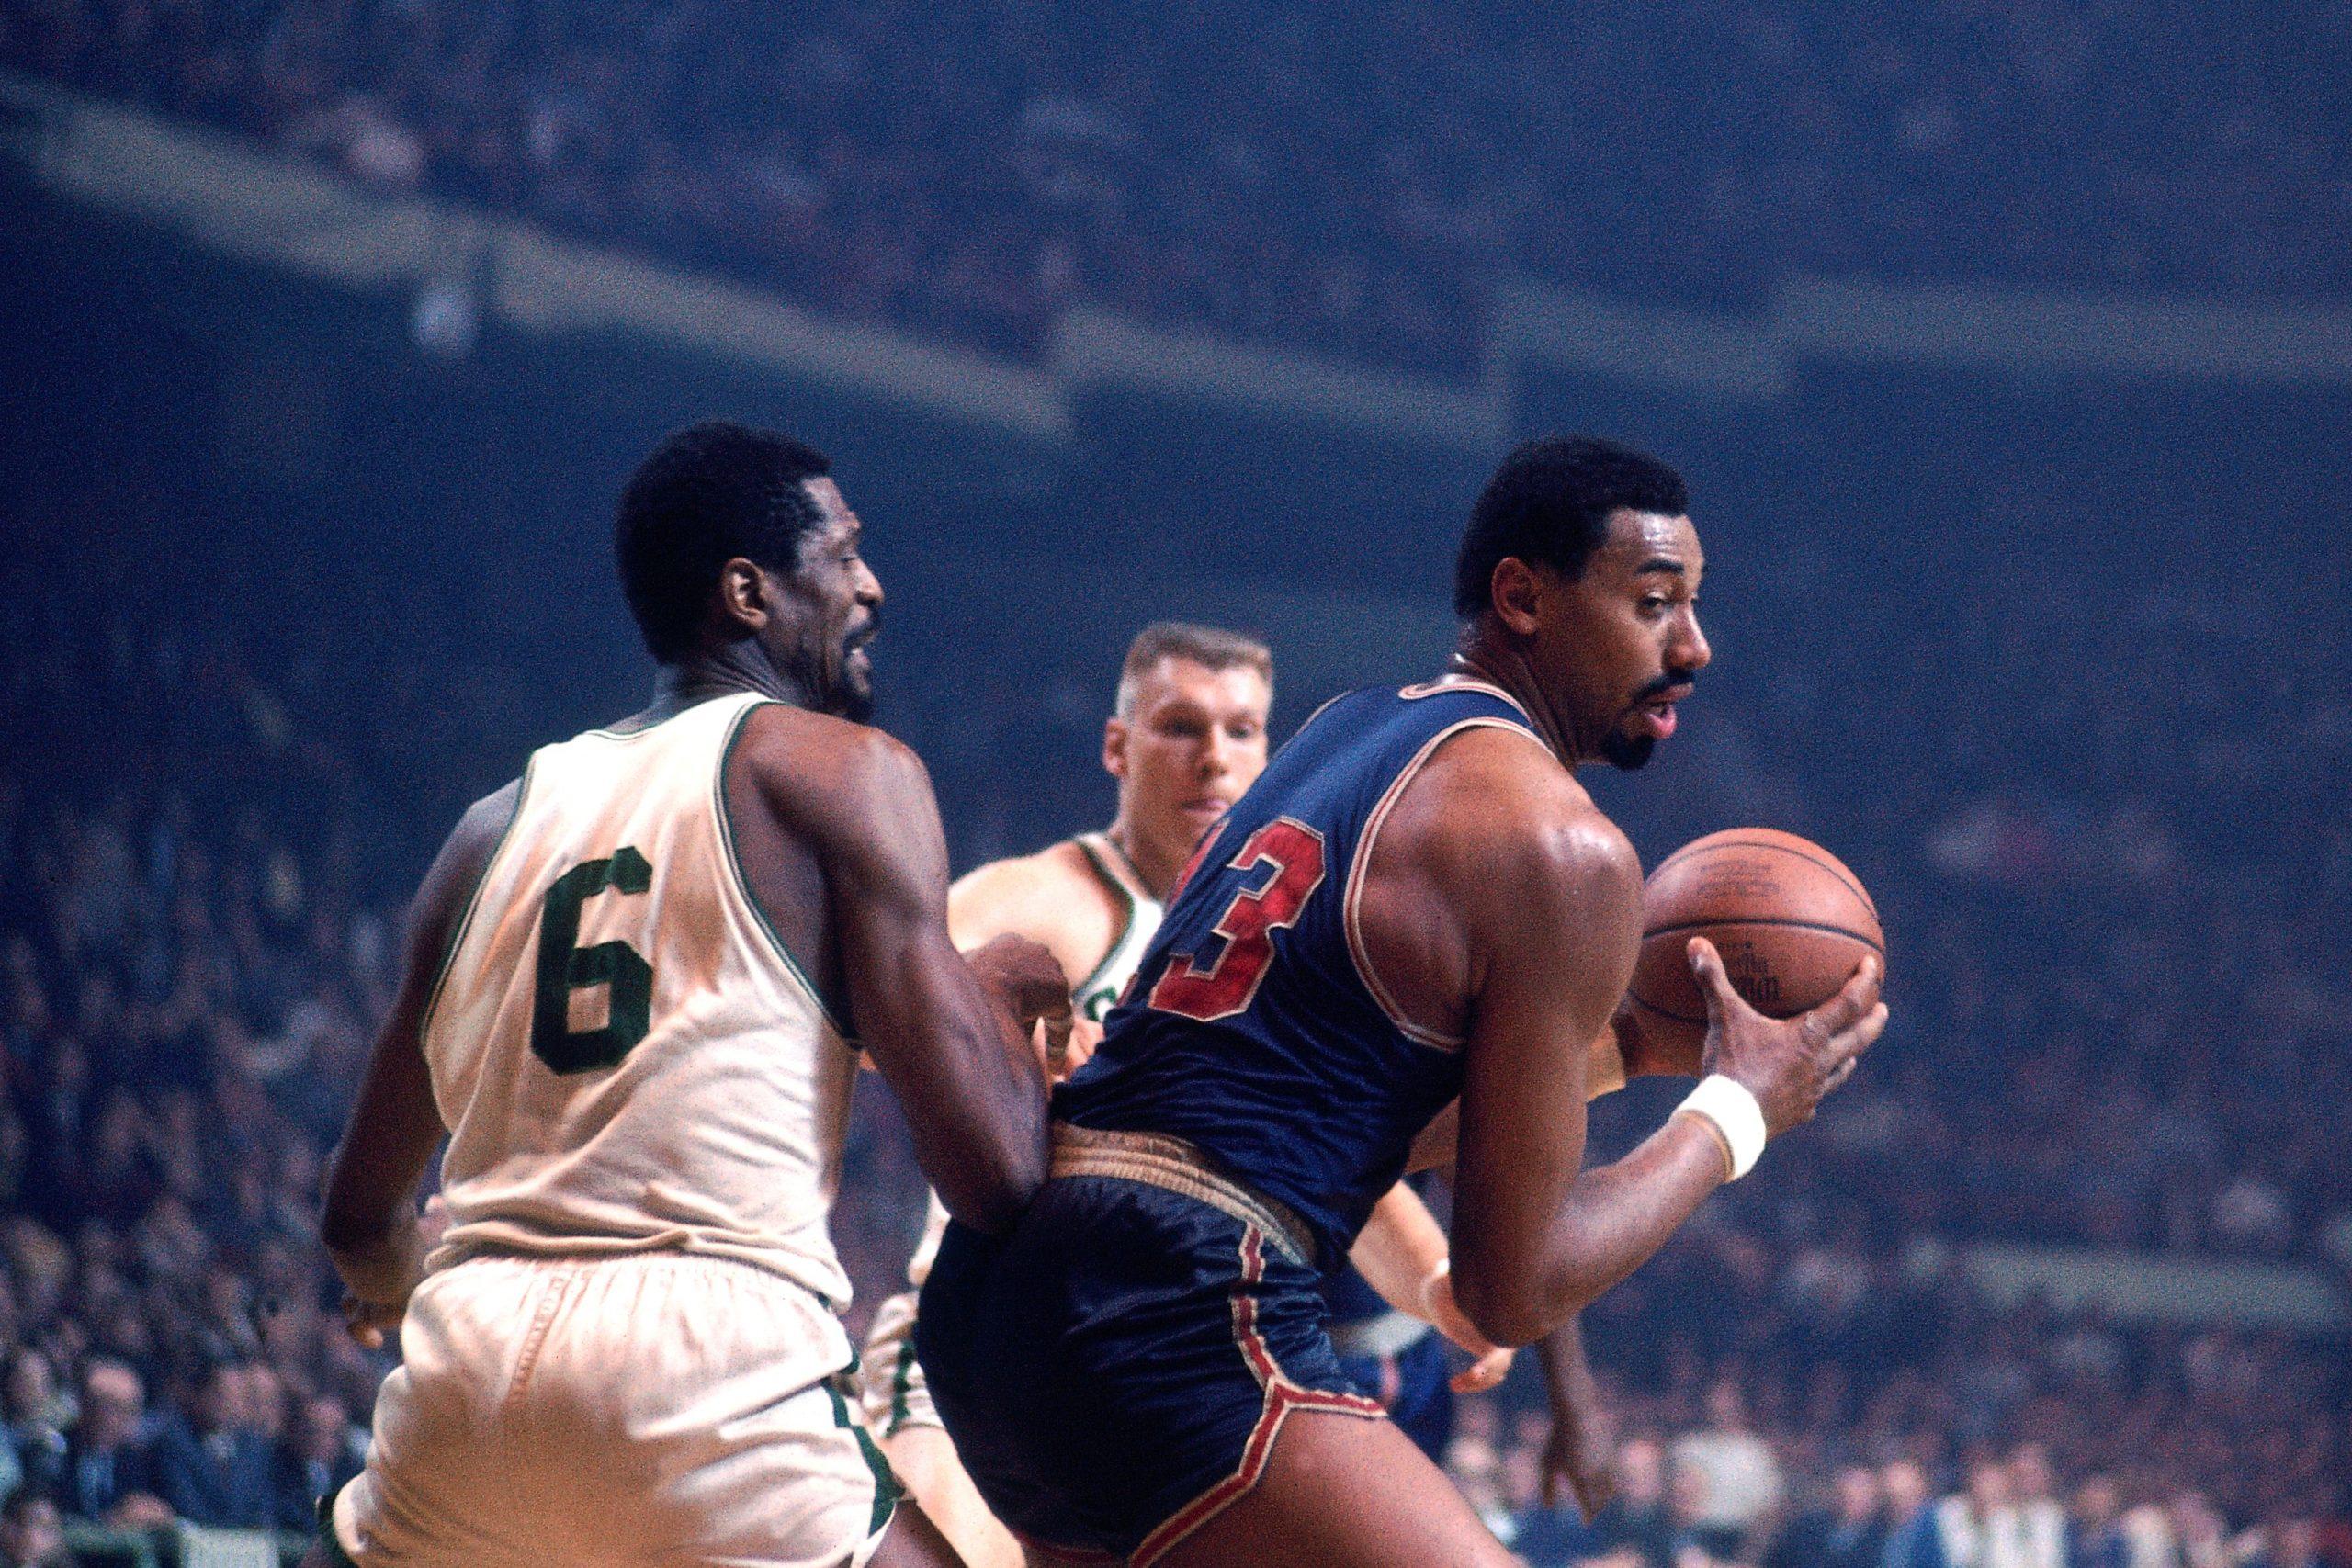 NBA Trivia, Wilt Chamberlain